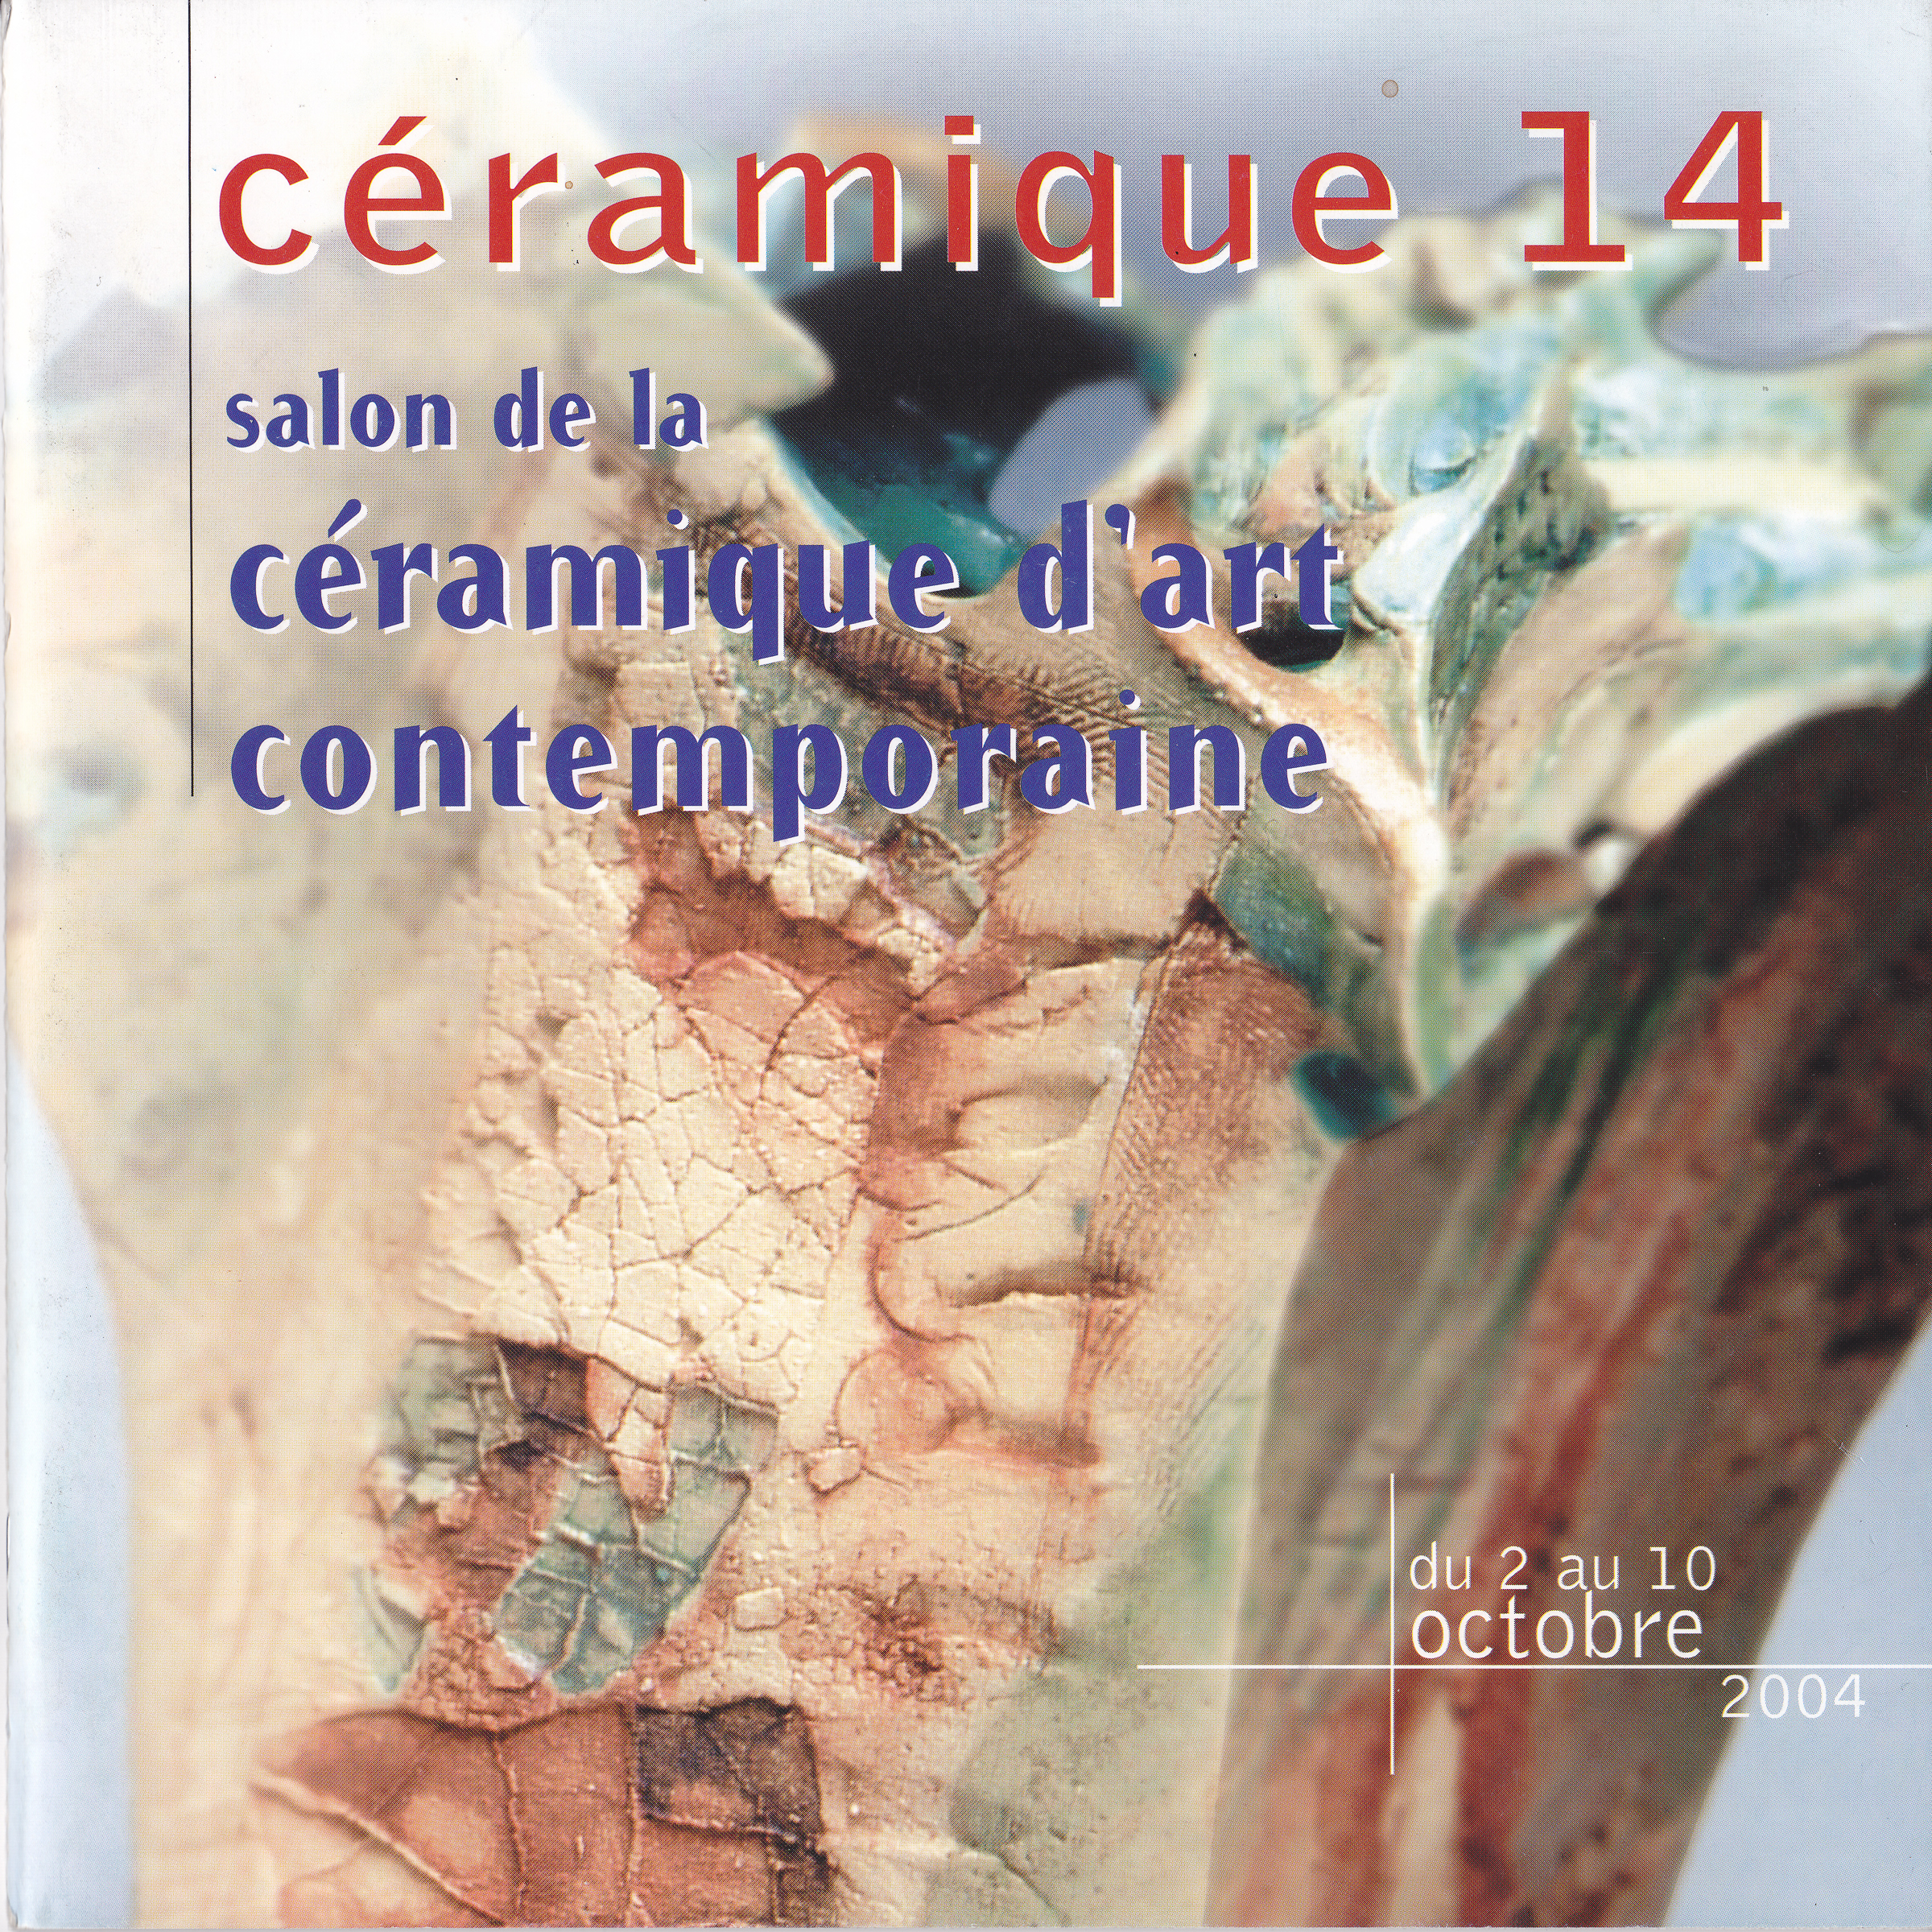 gallery 2004 cer 14 copy-3.jpg